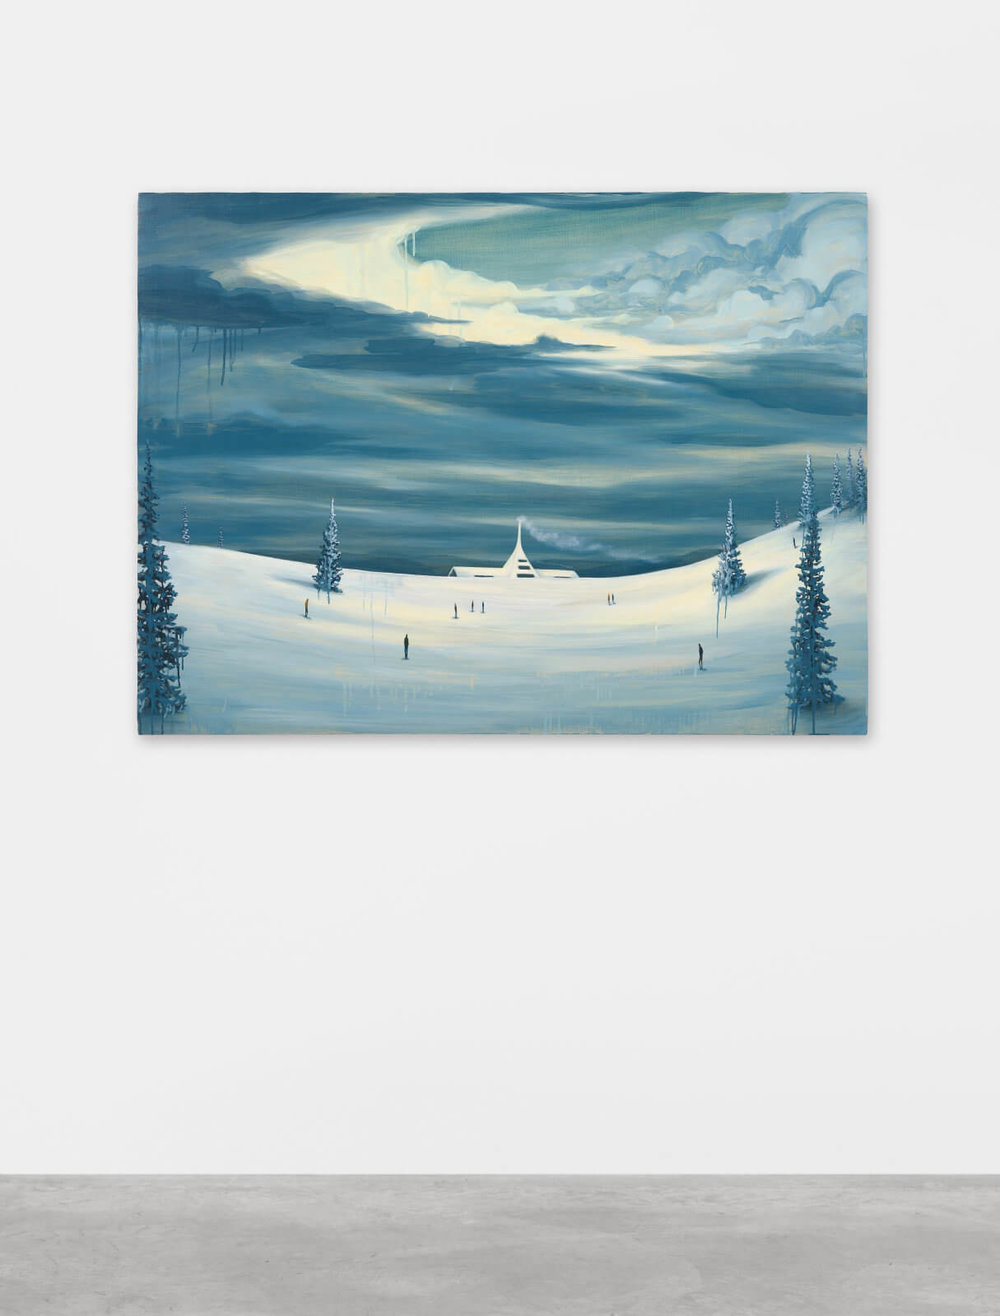 DA14031-Moutain-Lodge-in-Snow-2016-HIRES-1-1215x1600.jpg